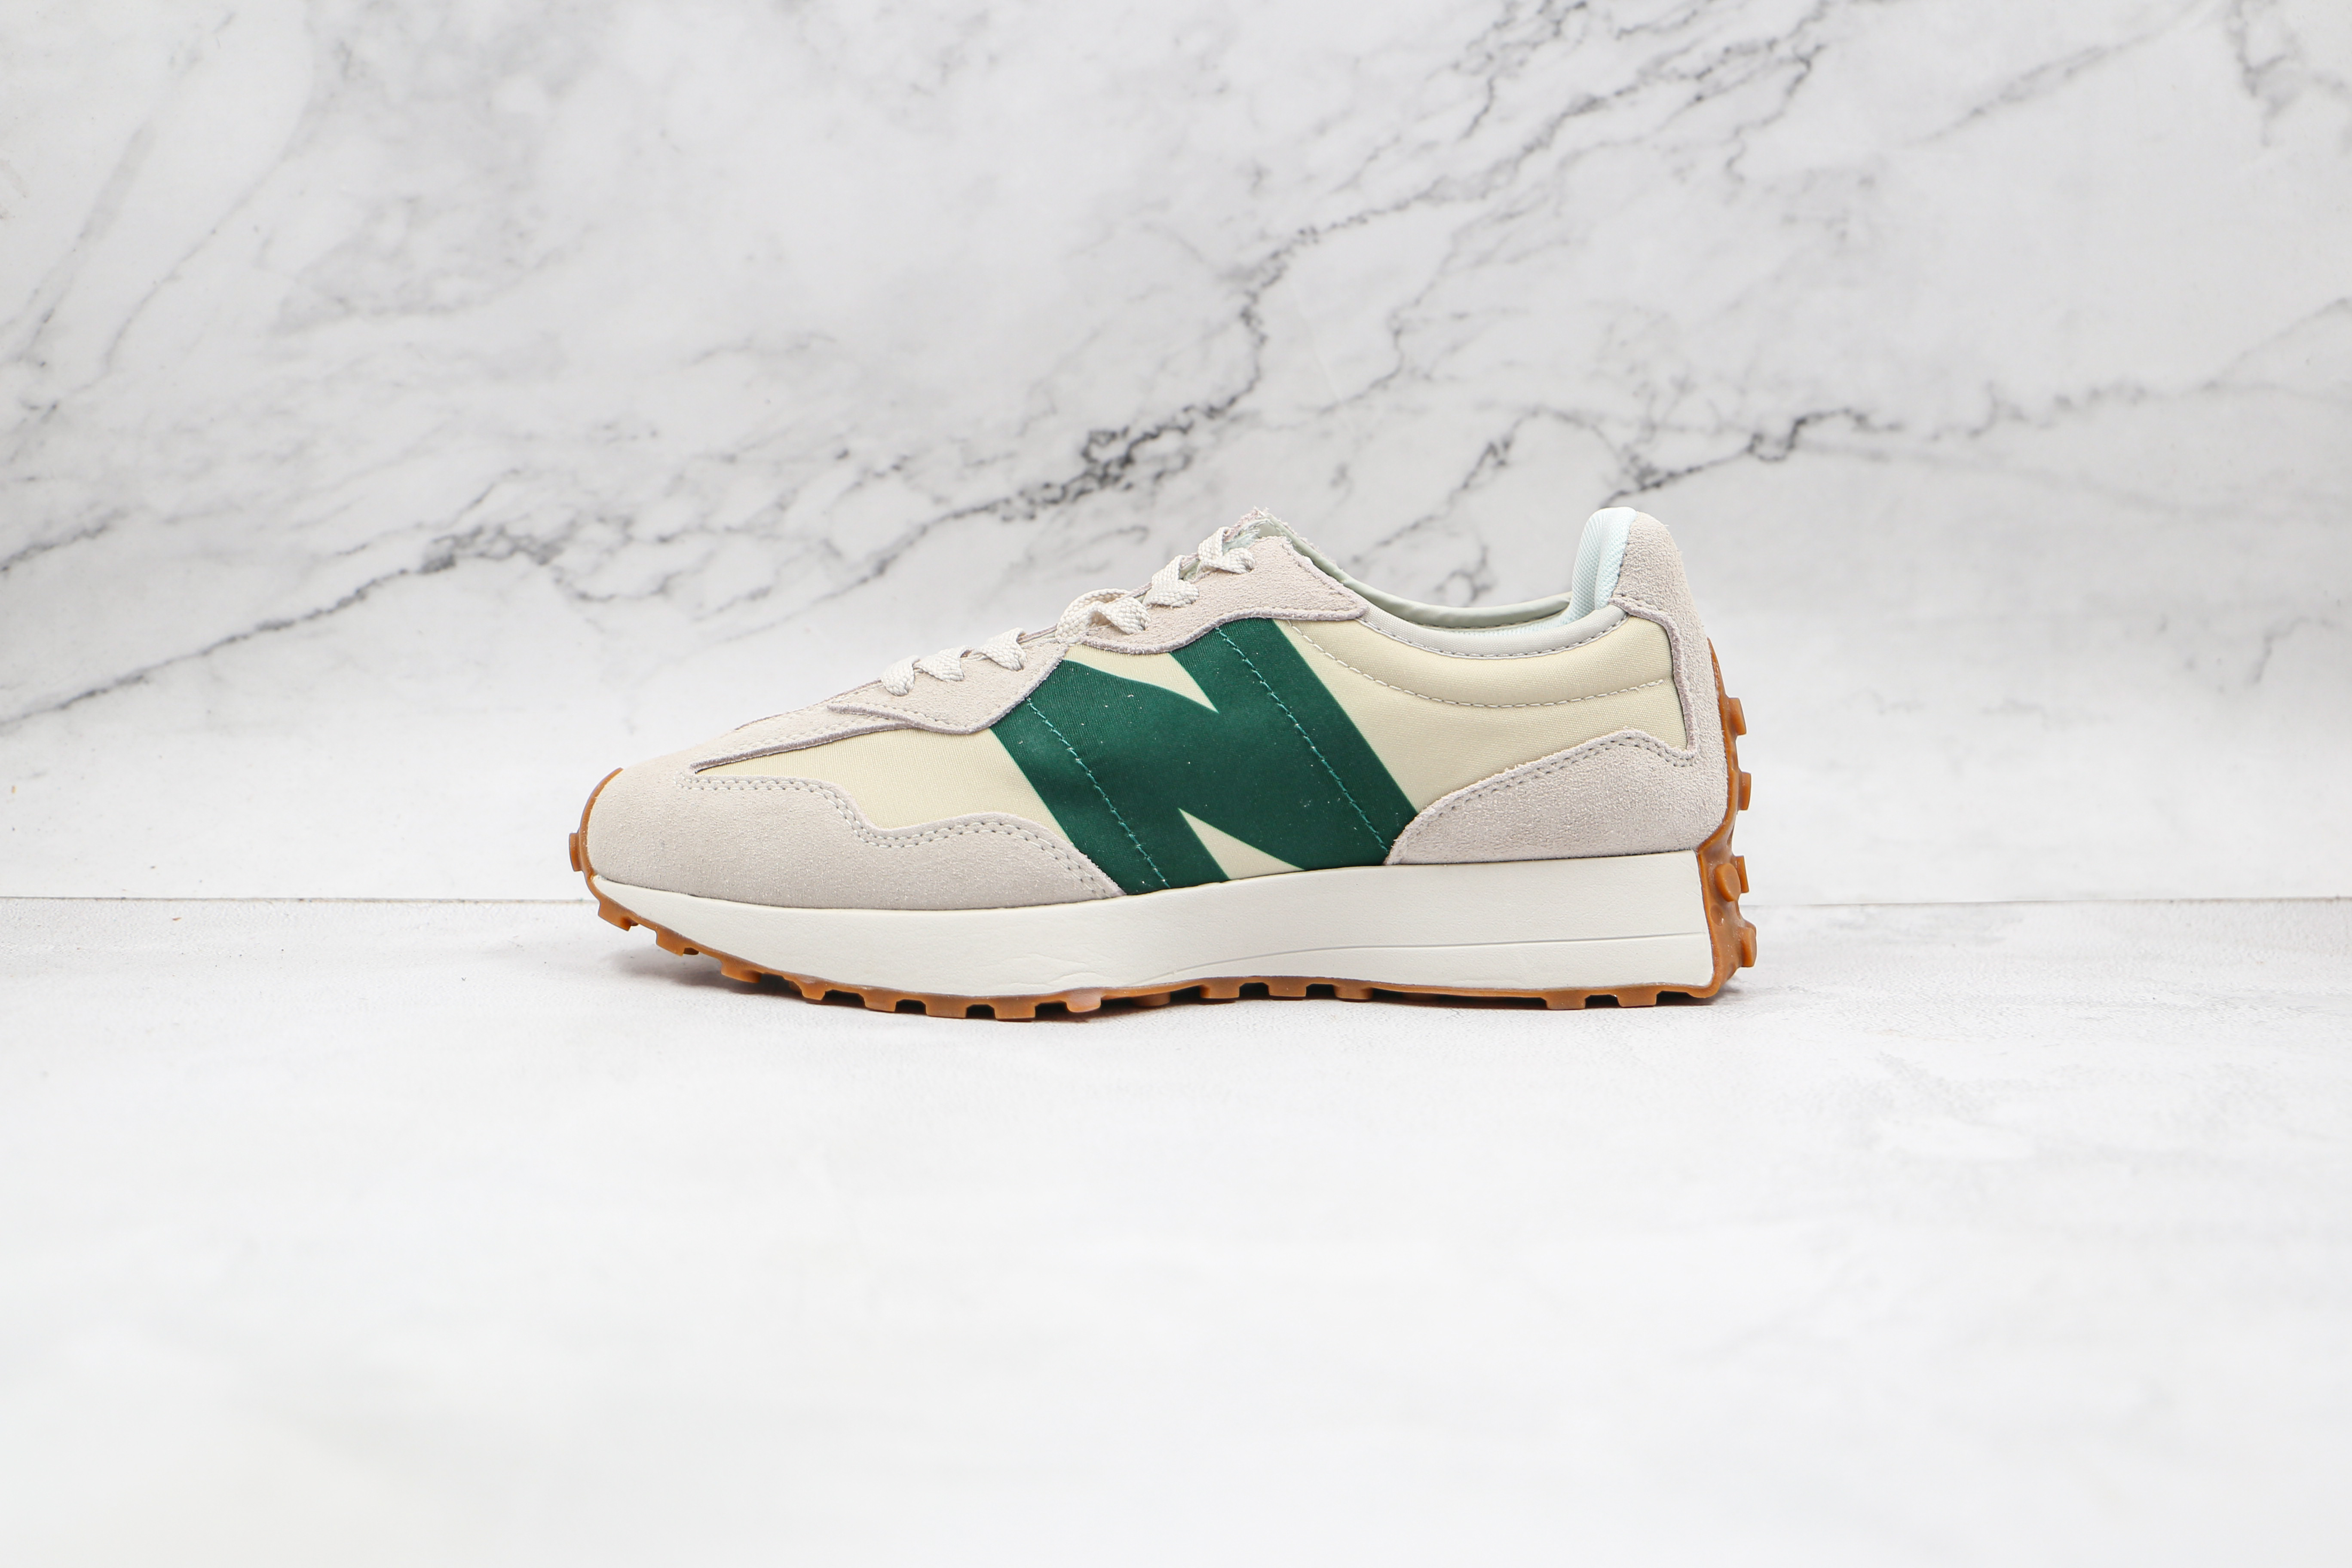 NB327 米绿色 #新百伦 #NB327  #NB 复古慢跑鞋 货号:MS3271HR1 New Balance 327 复古先锋     M23-5